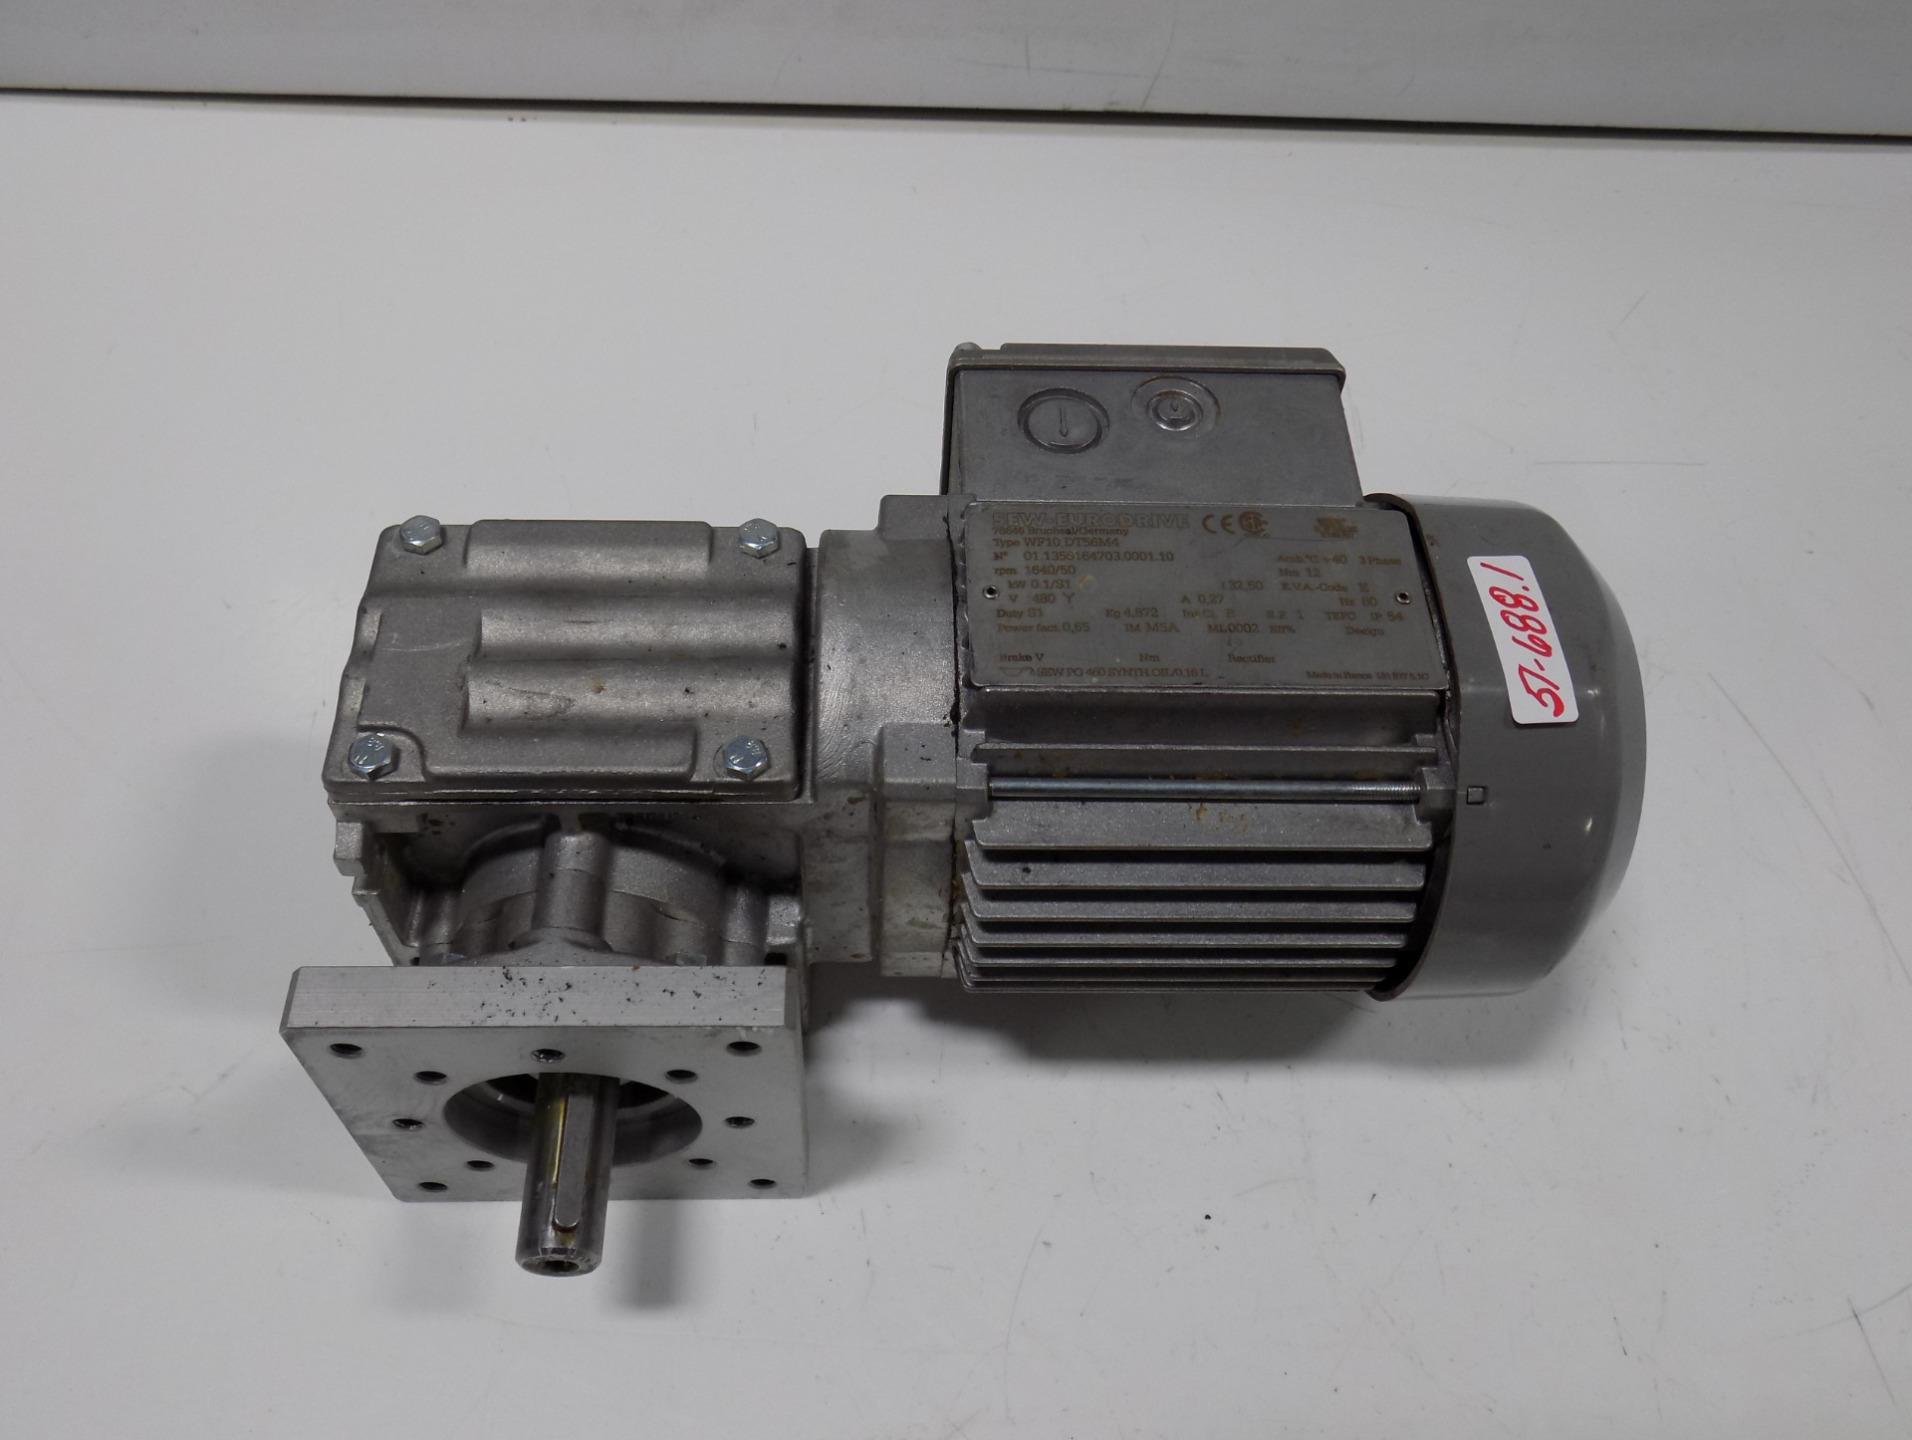 Sew Eurodrive Gear Motor 3 Phase Wf10dt56m4 Ebay